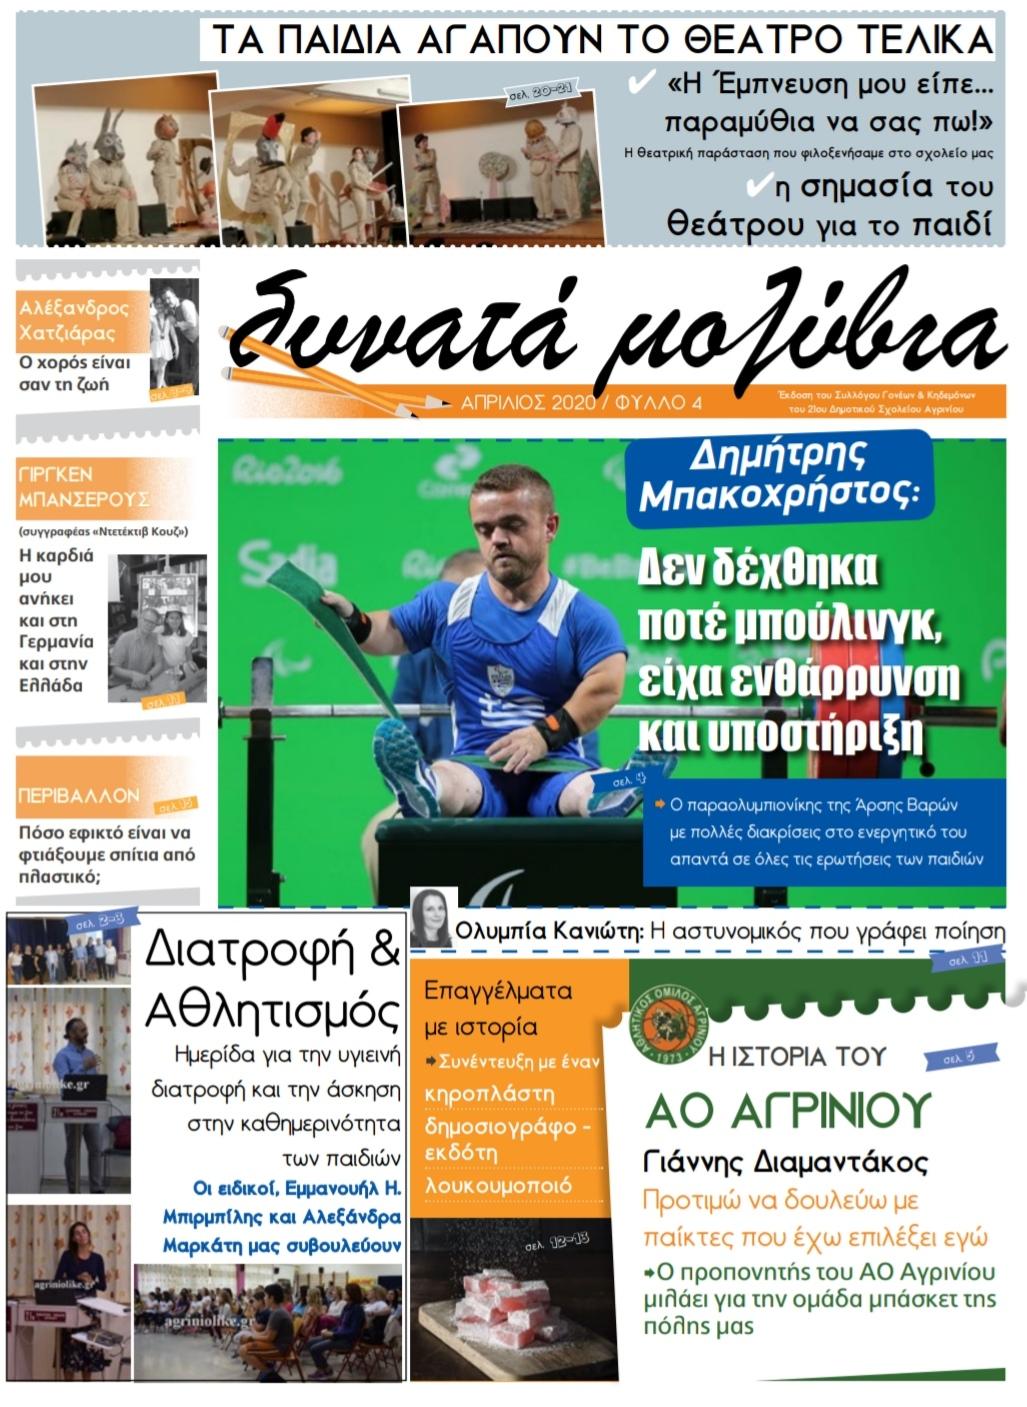 Mε ενδιαφέροντα θέματα το 4ο φύλλο της εφημερίδας του 21ου Δημοτικού Σχολείου Αγρινίου